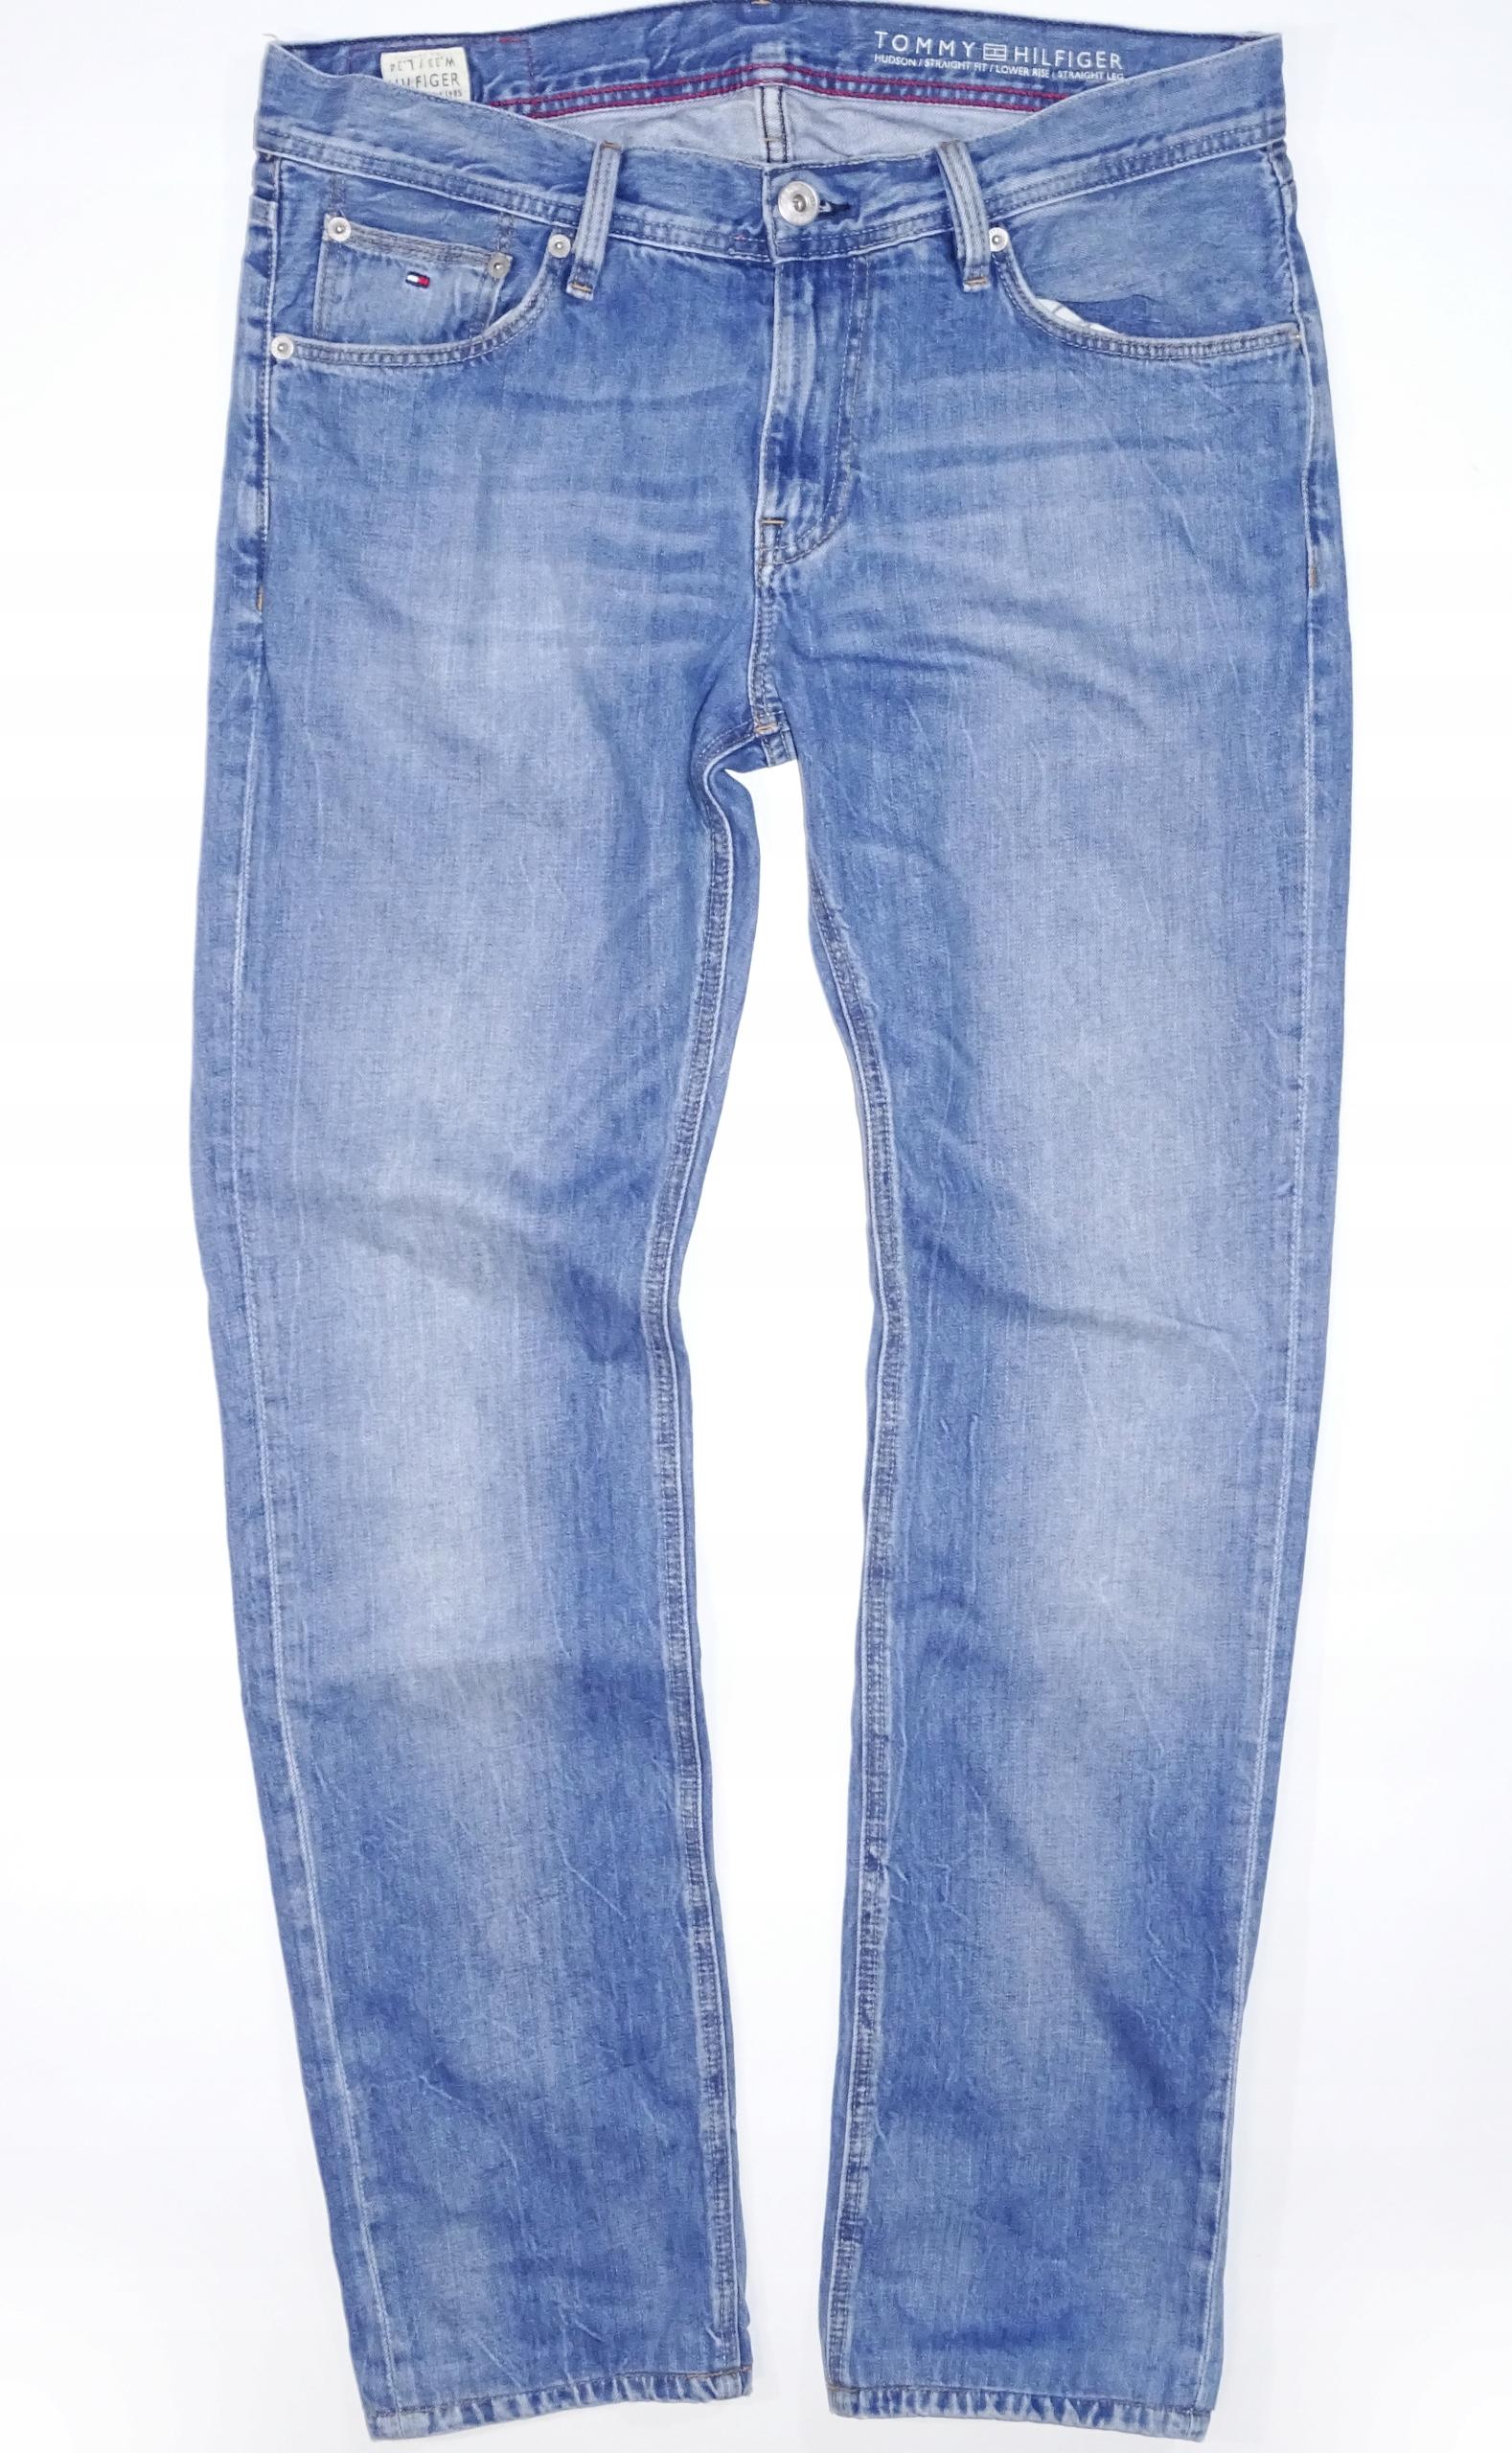 031d36524be06f TOMMY HILFIGER HUDSON Spodnie męskie jeans p-90cm - 7727069448 ...